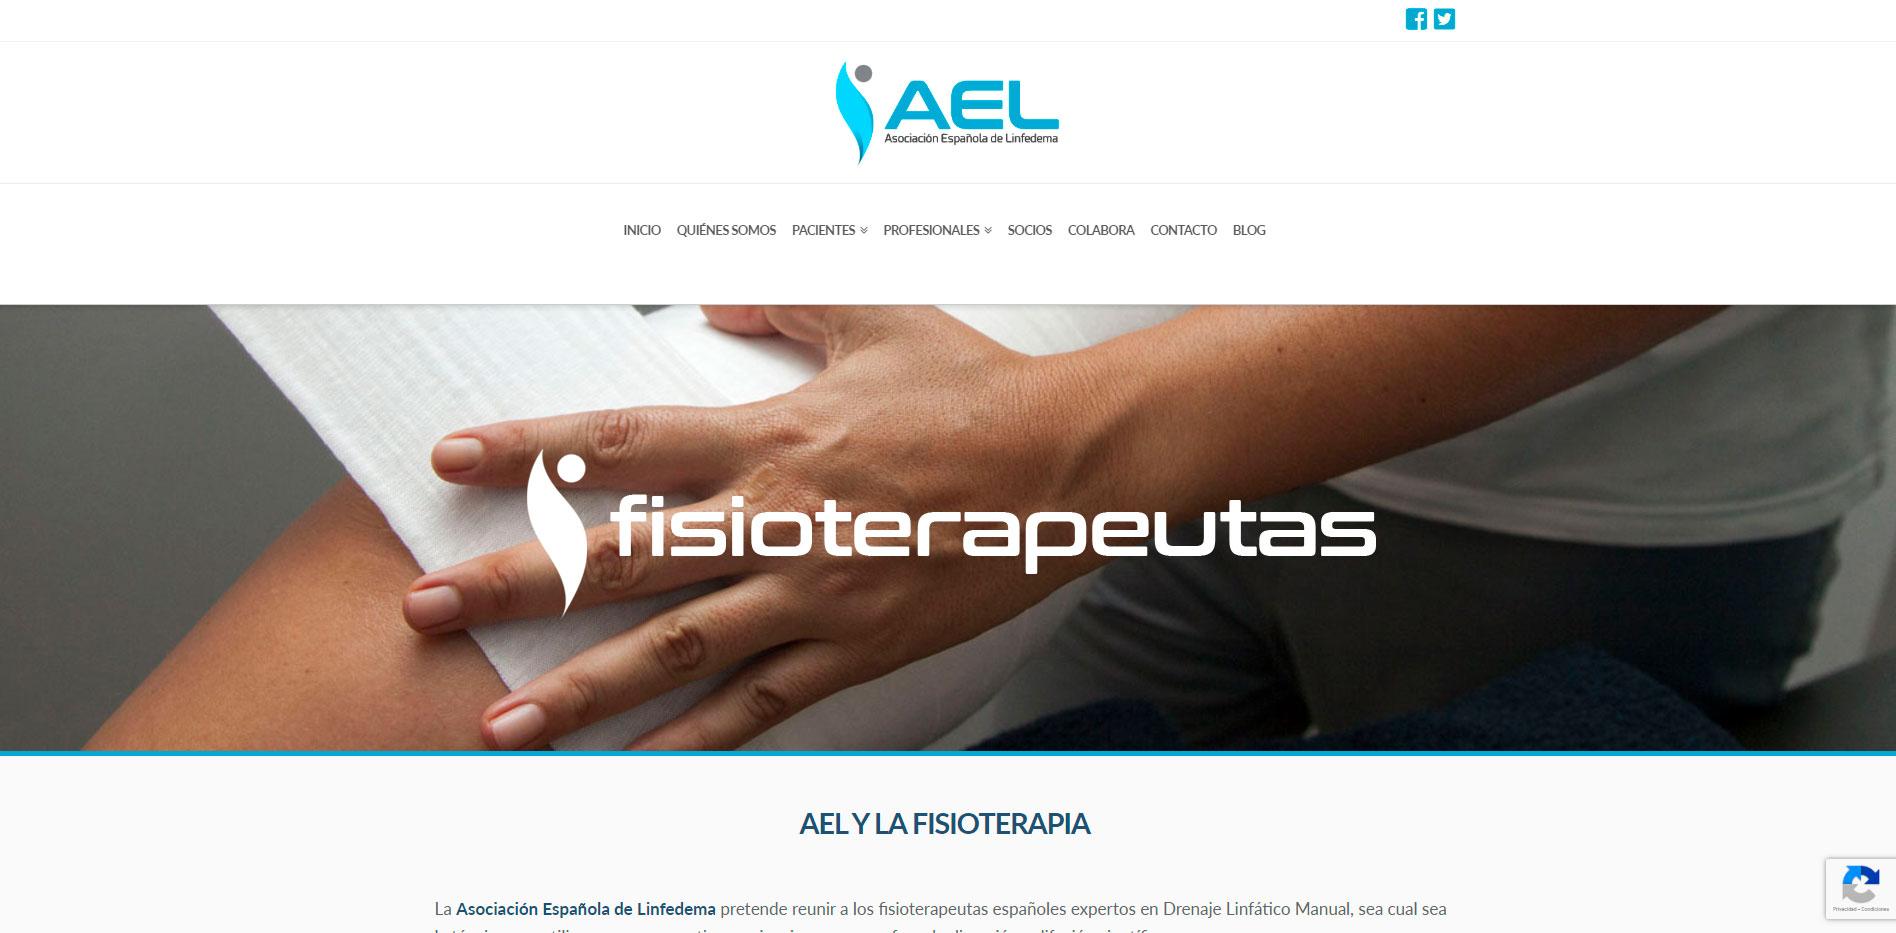 web_AEL